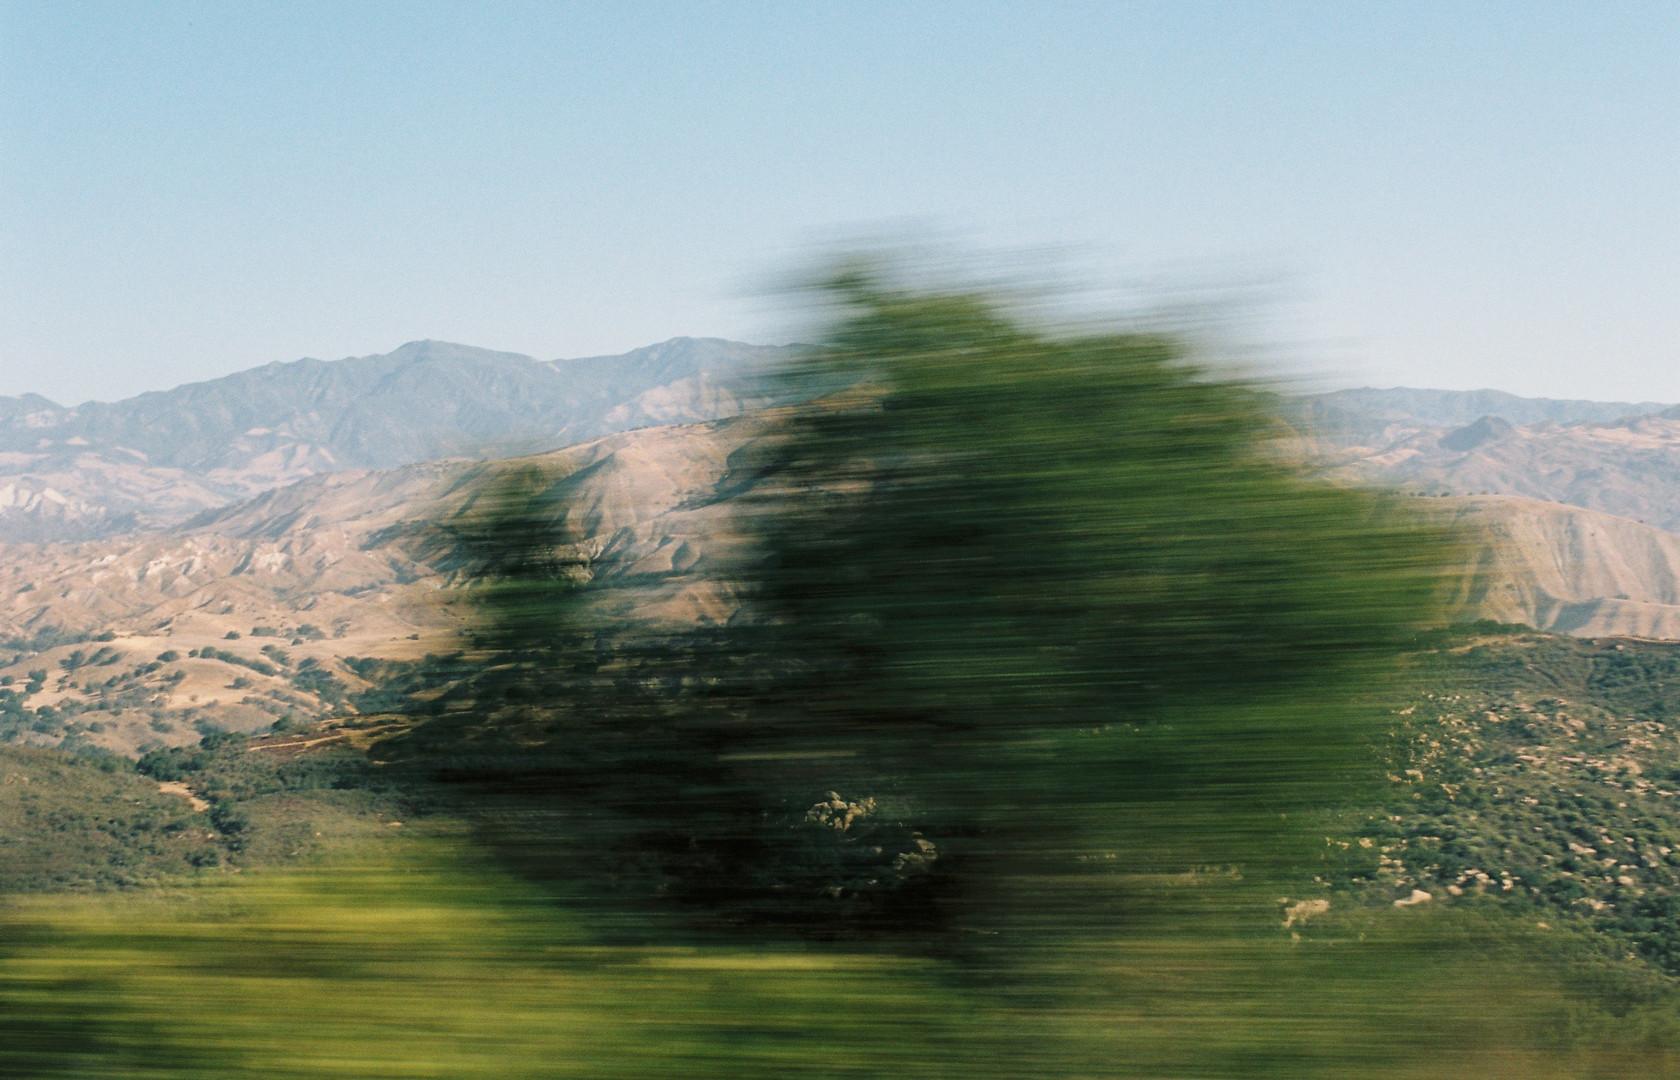 Blurry Road Trip